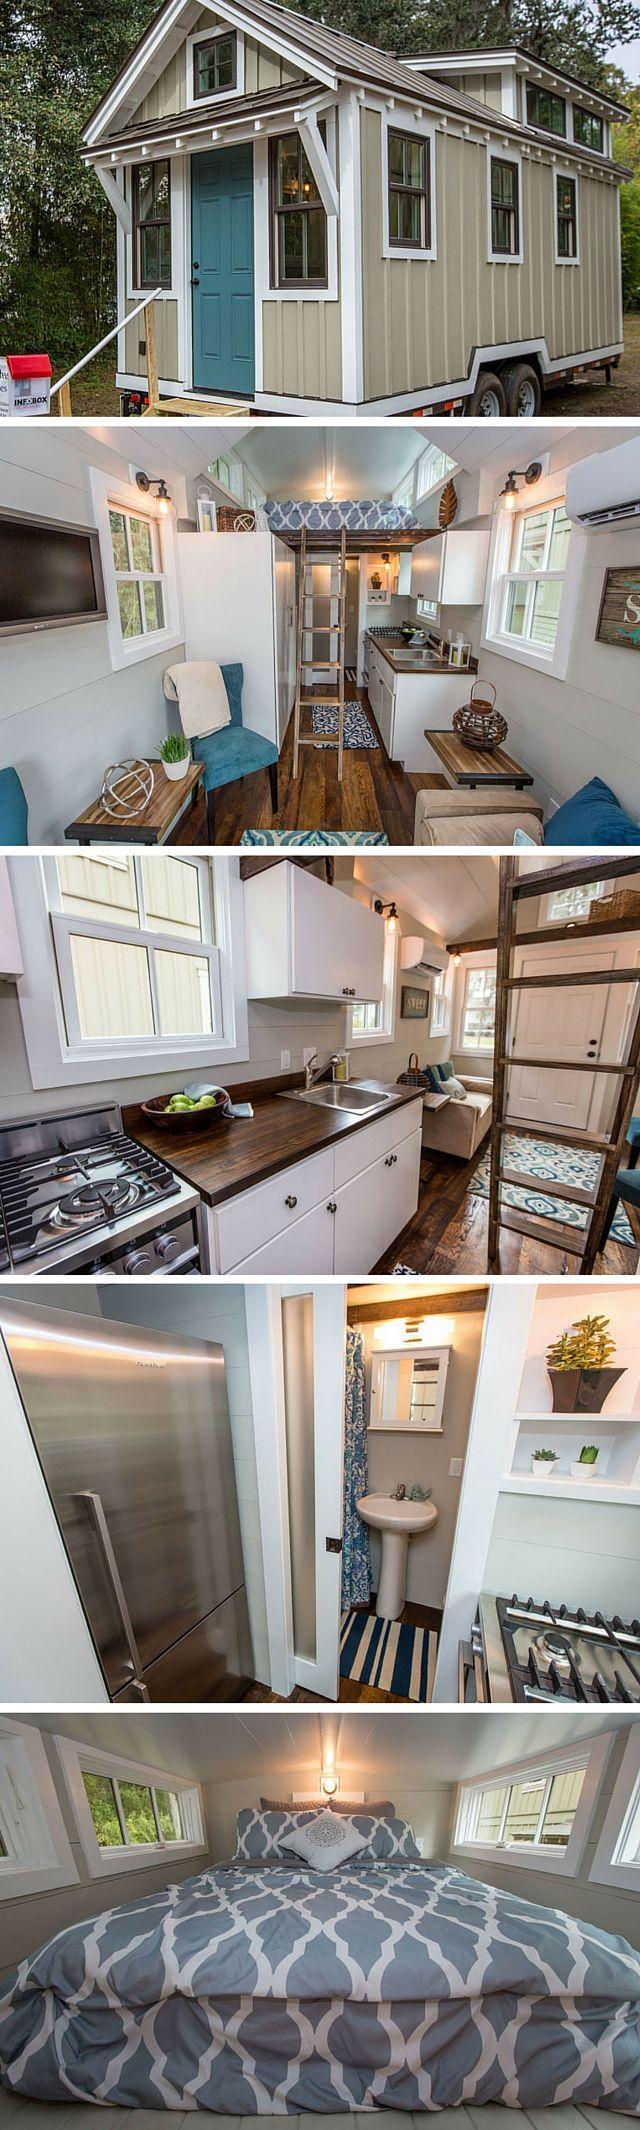 A tiny house from Driftwood Tiny Homes